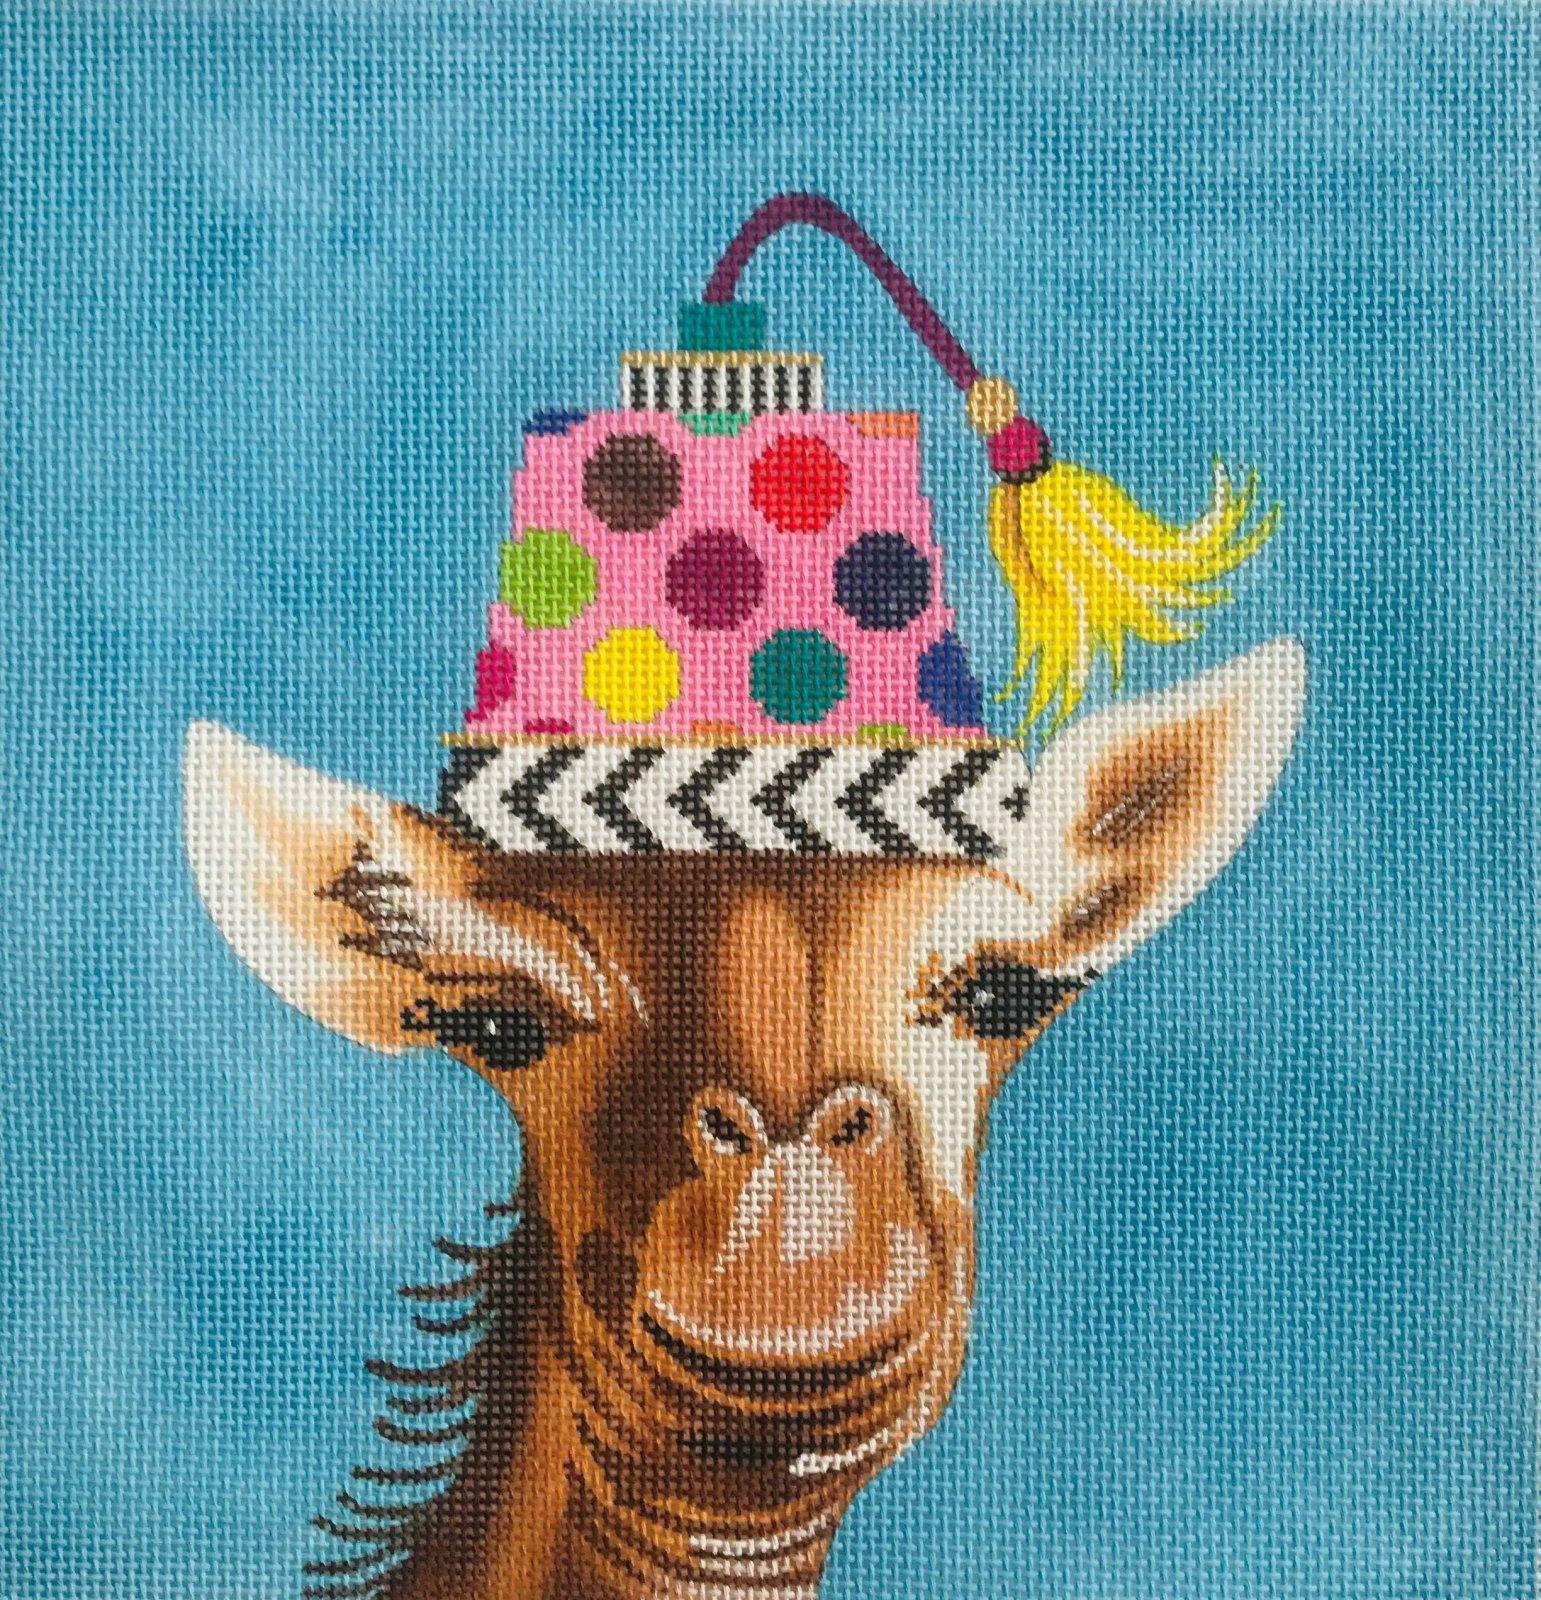 Giraff with Hat